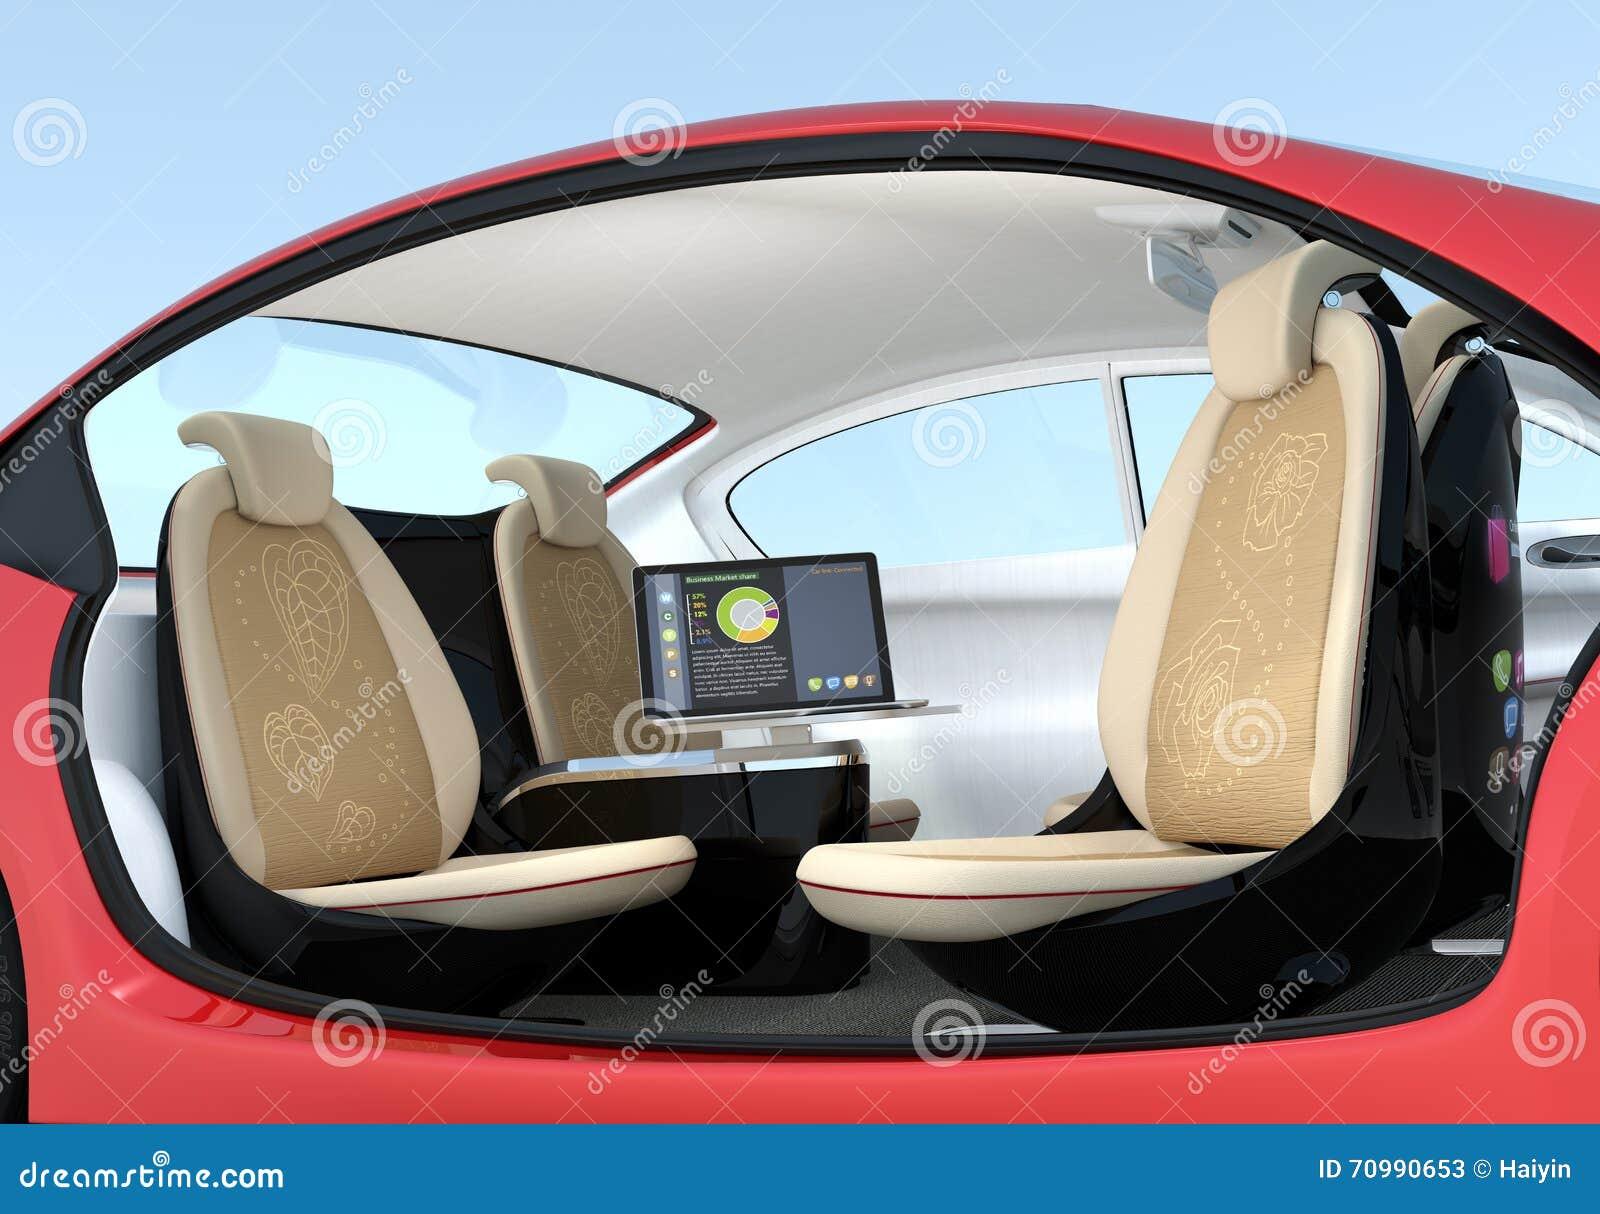 self driving car interior concept stock illustration illustration of auto robot 70990653. Black Bedroom Furniture Sets. Home Design Ideas